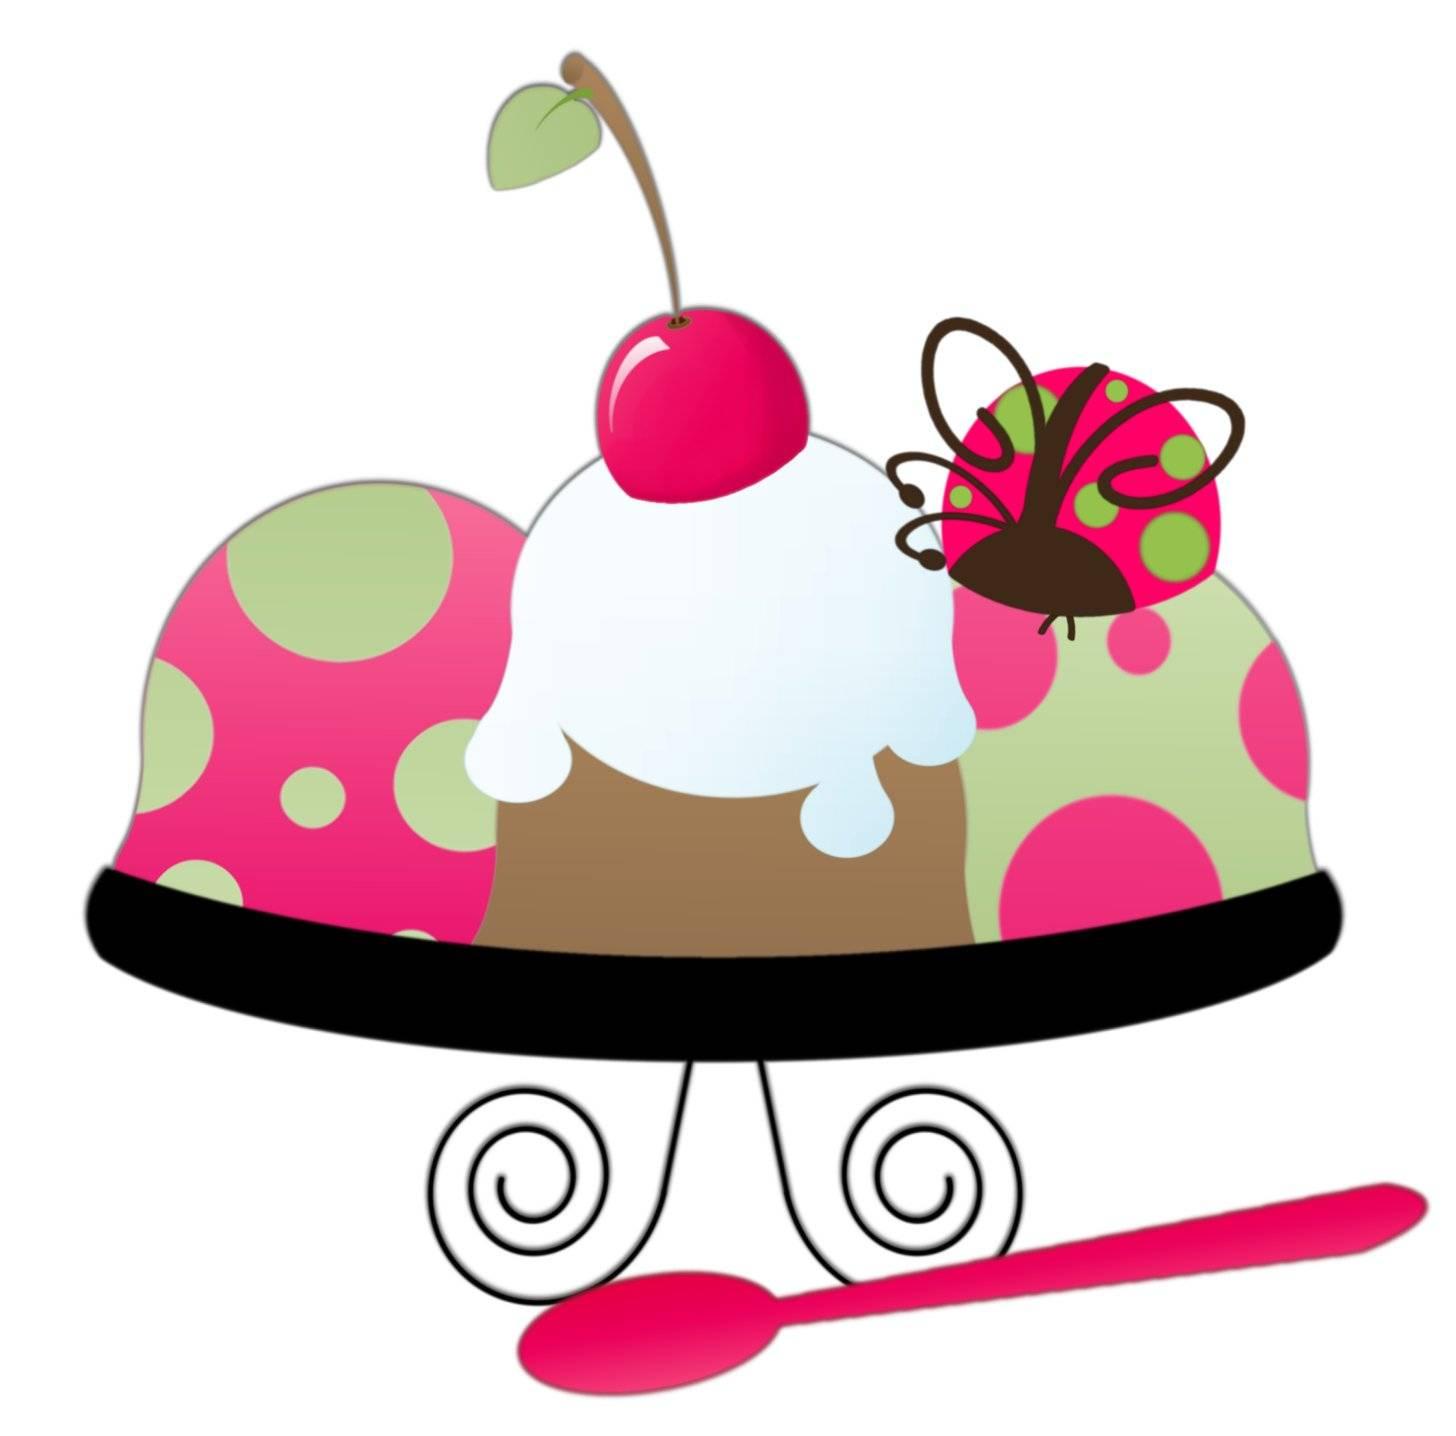 Ice cream sundae clipart free images 6